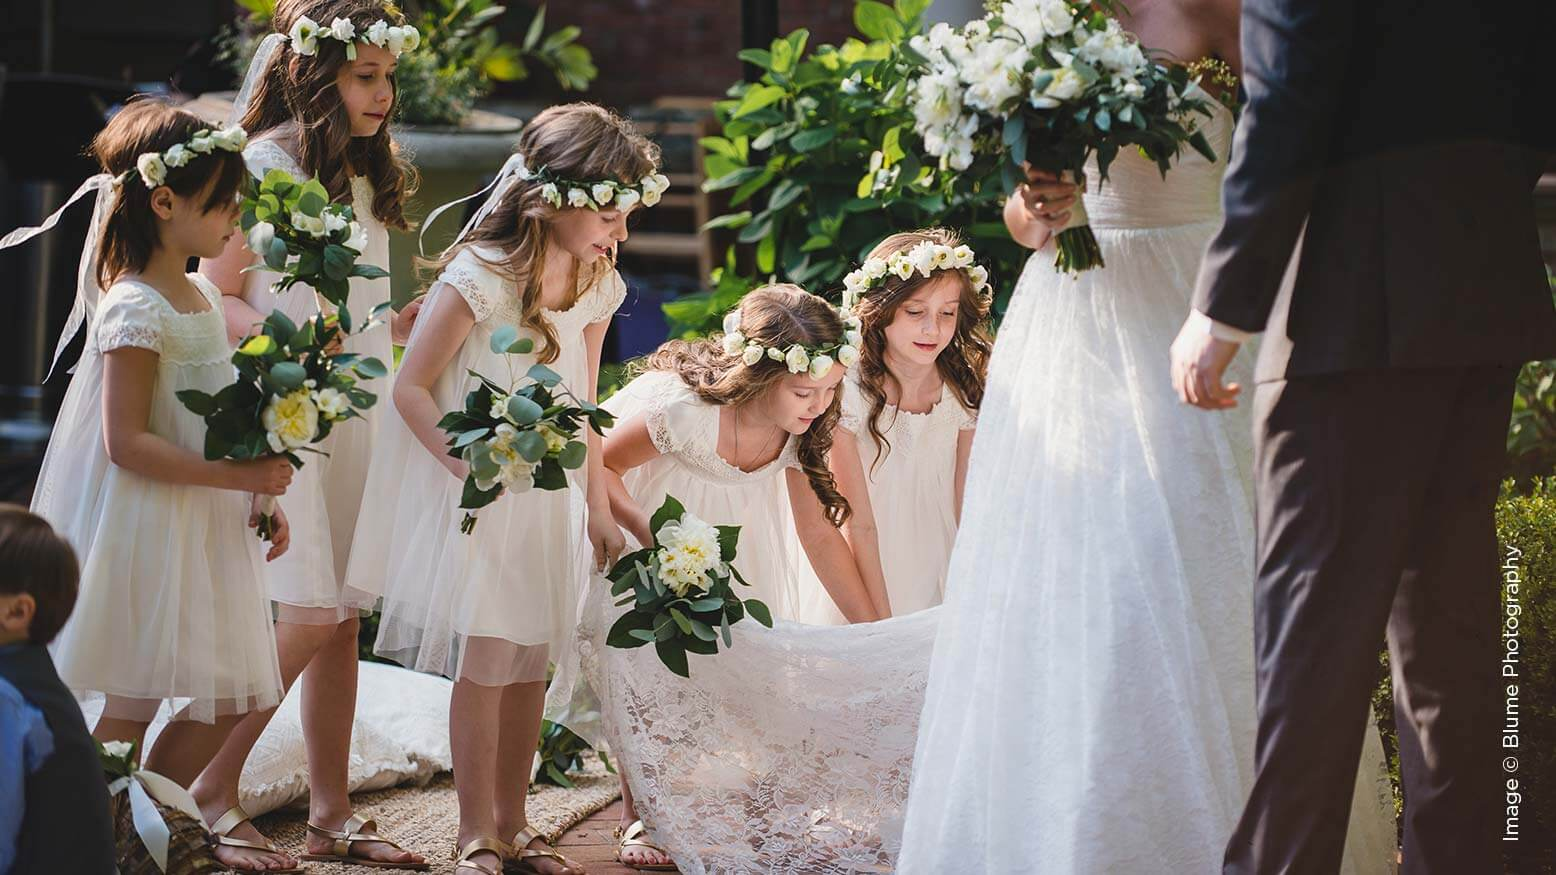 Turning Stressful Weddings into Glamorous Experiences